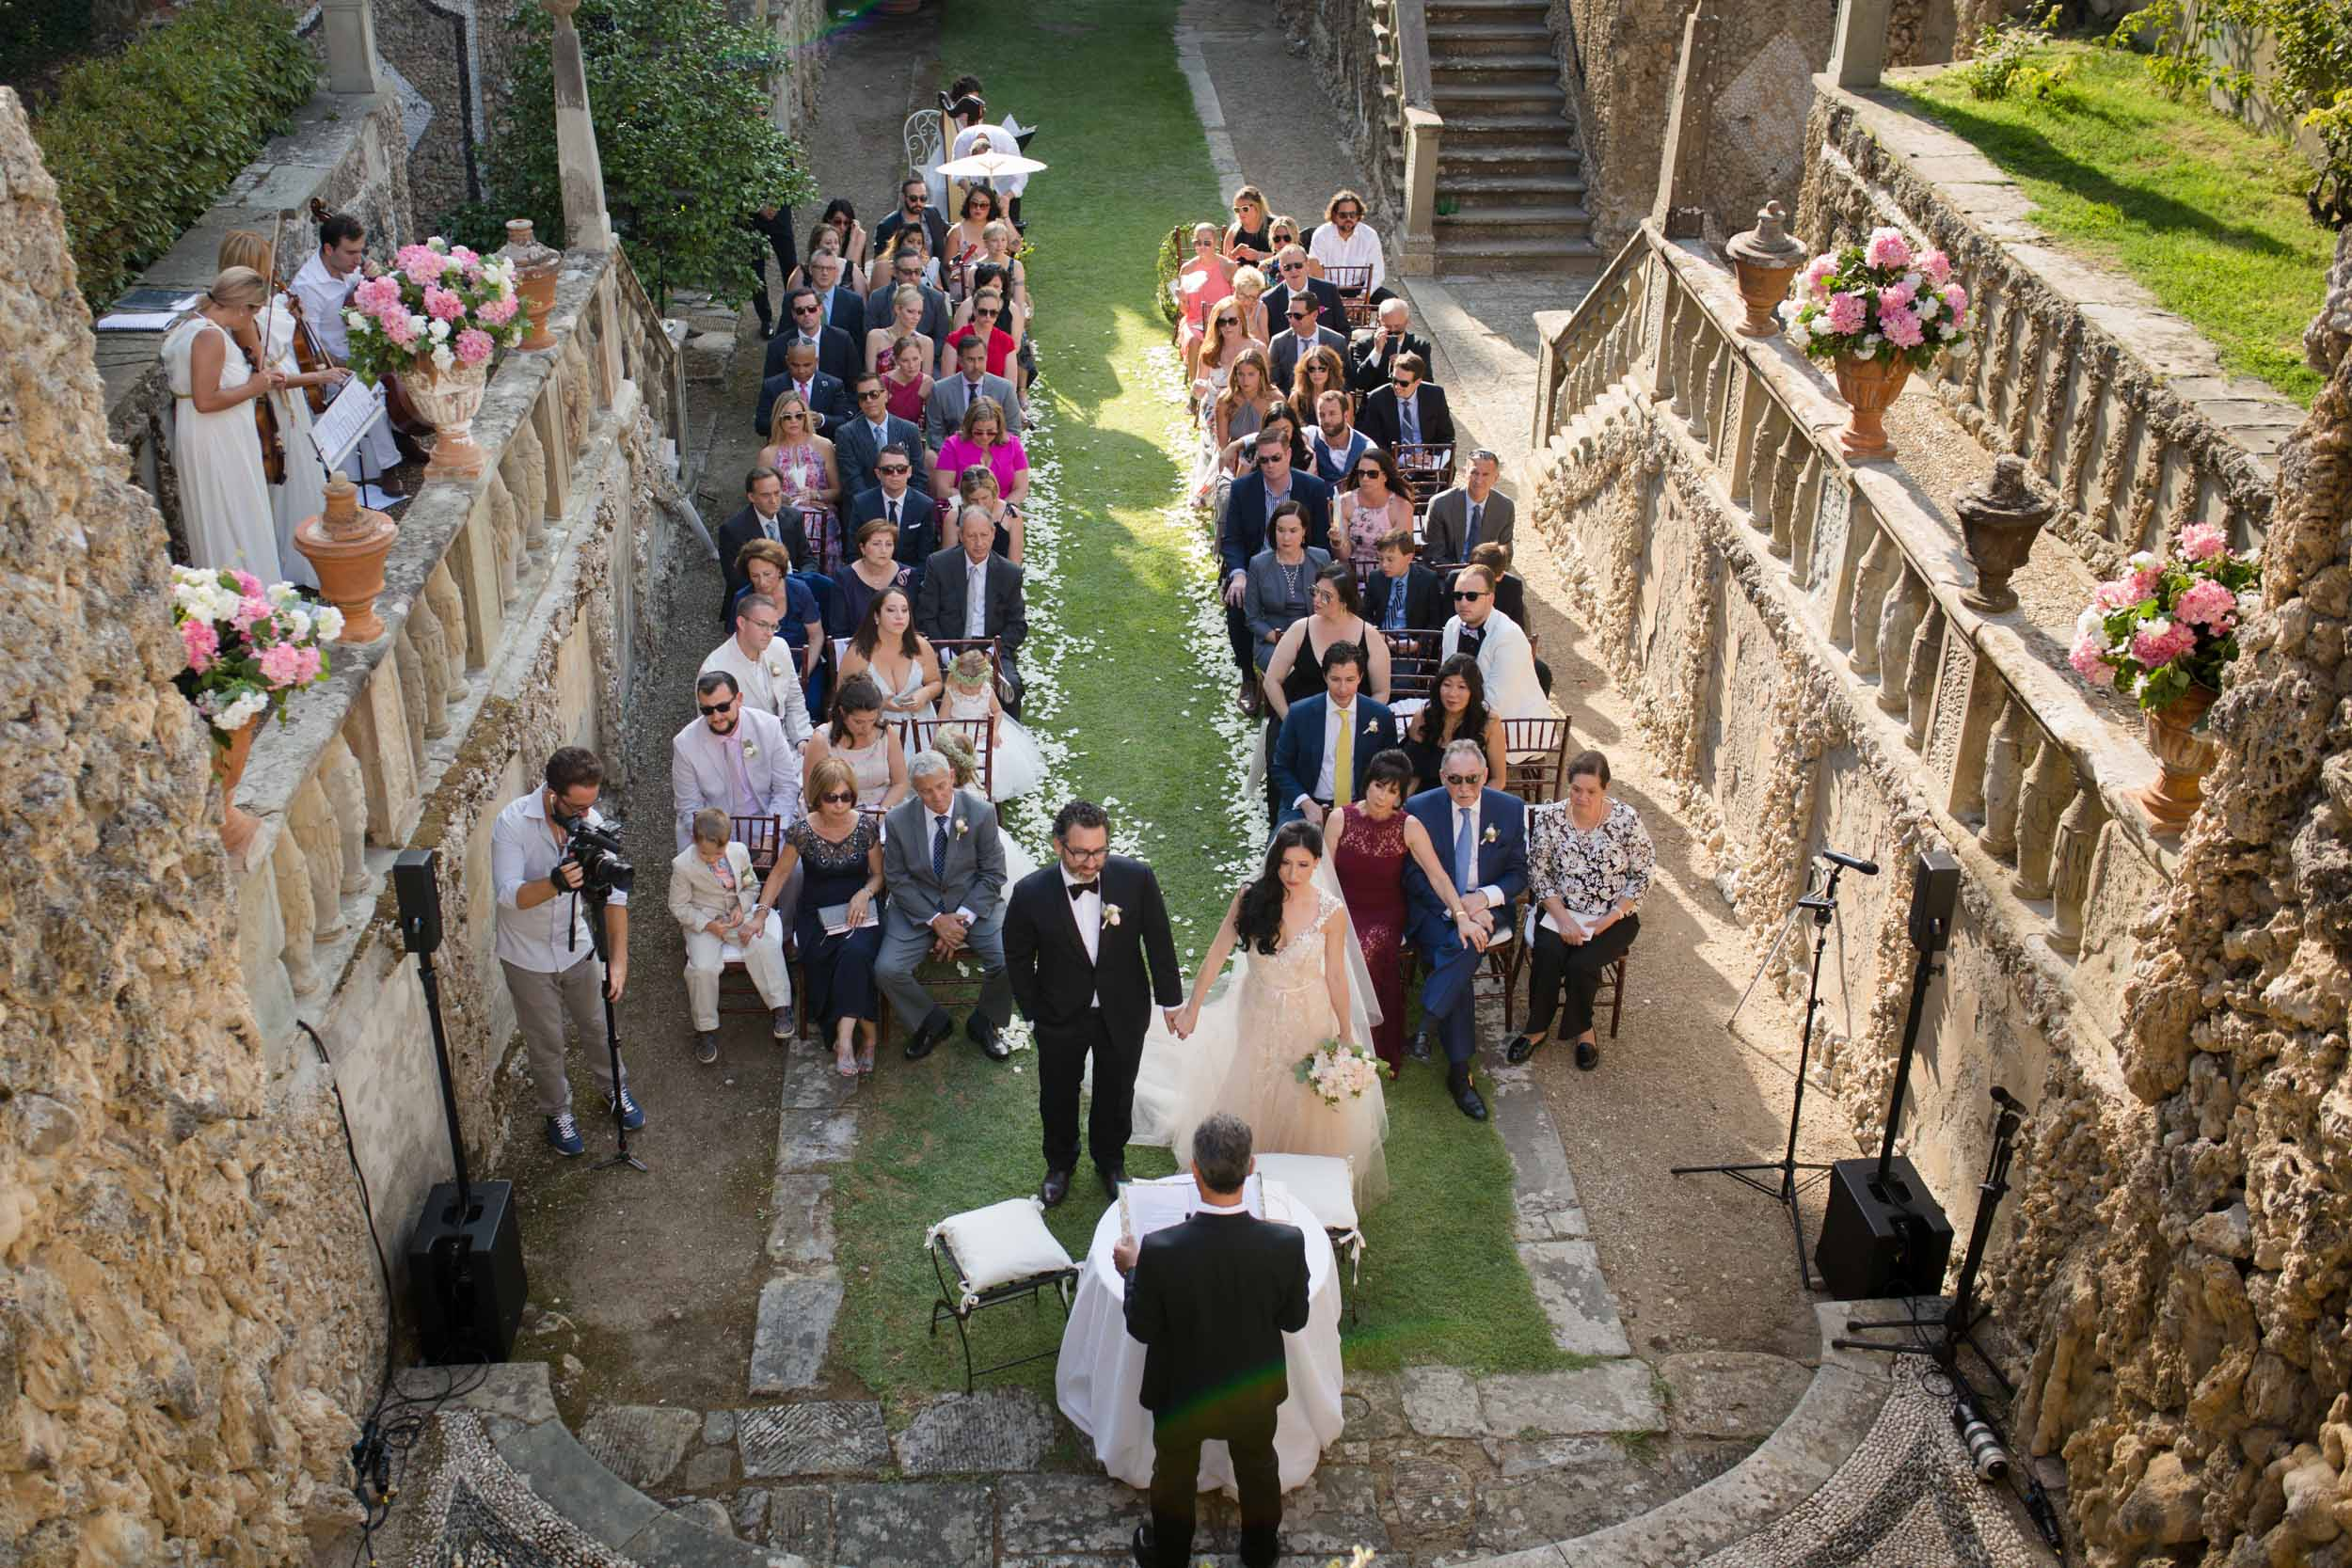 villa-gamberaia-florence-italy-destination-wedding-35.jpg